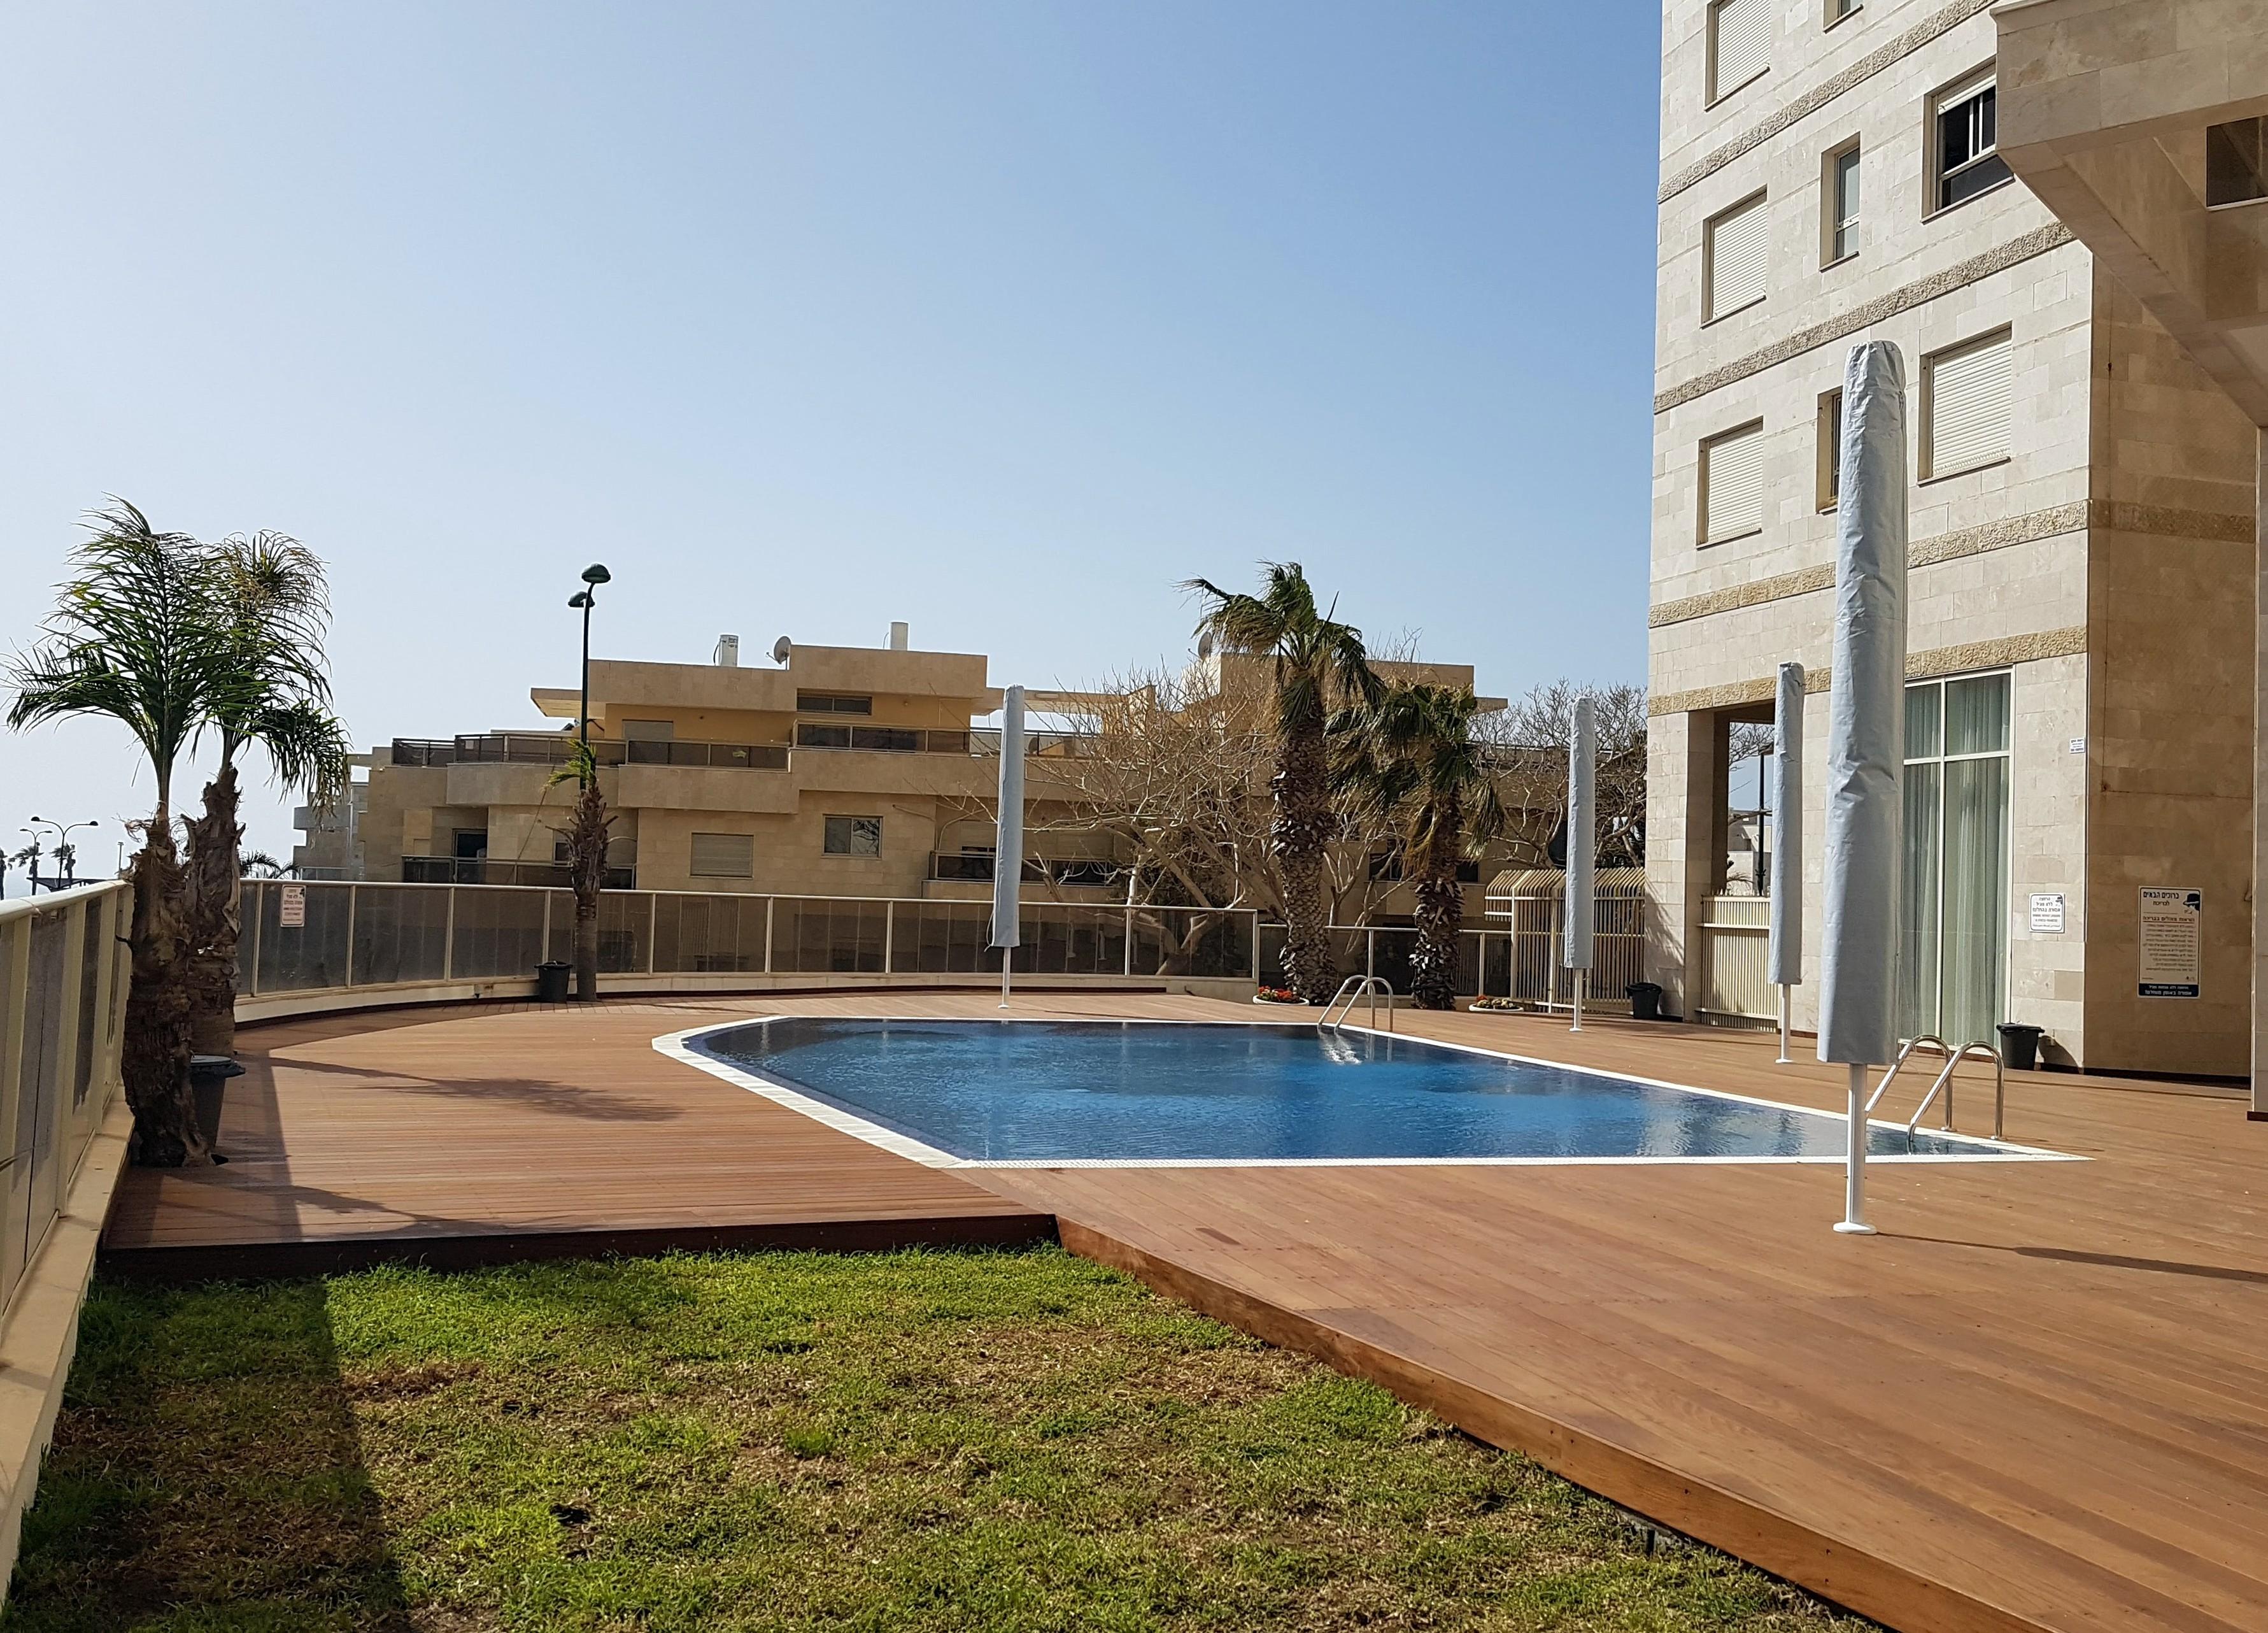 Royal Residence - 2 Bedroom Apartment with Pool, South Beach Netanya ...